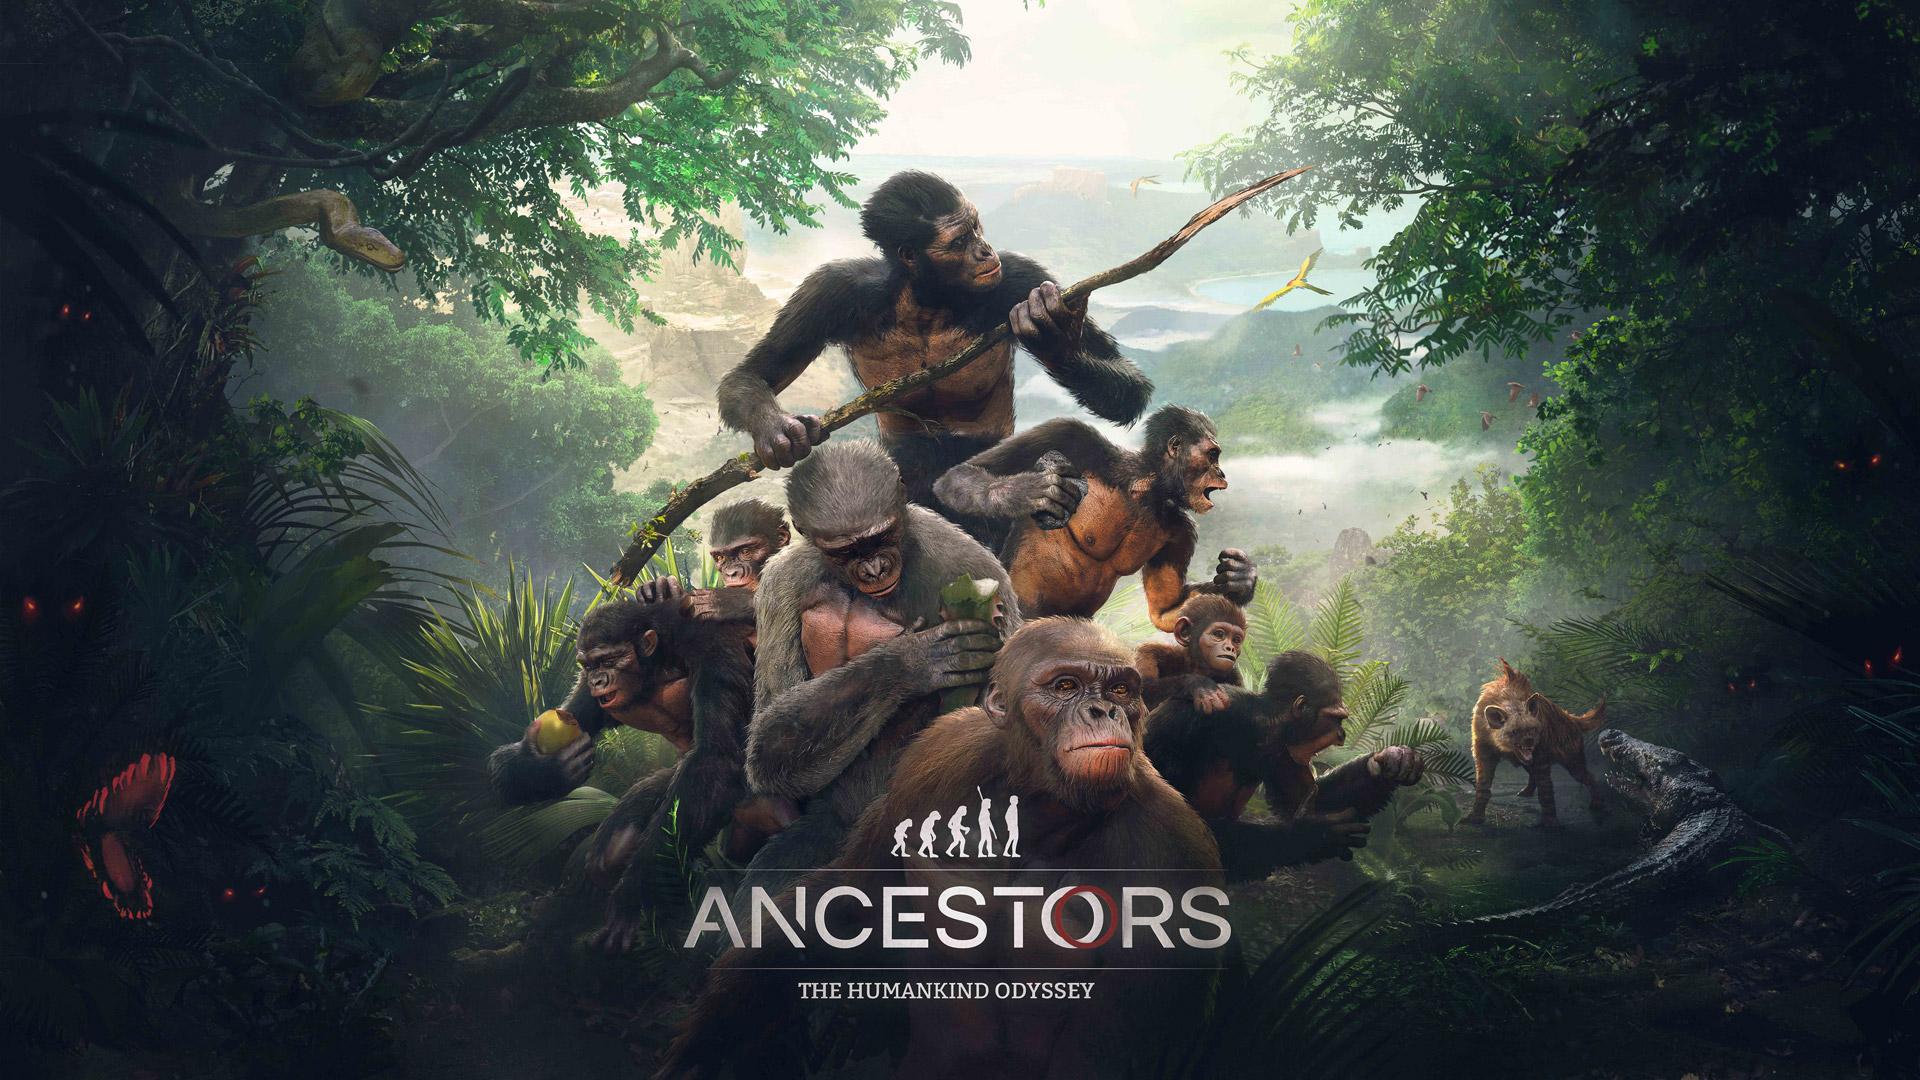 Free Ancestors: The Humankind Odyssey Wallpaper in 1920x1080